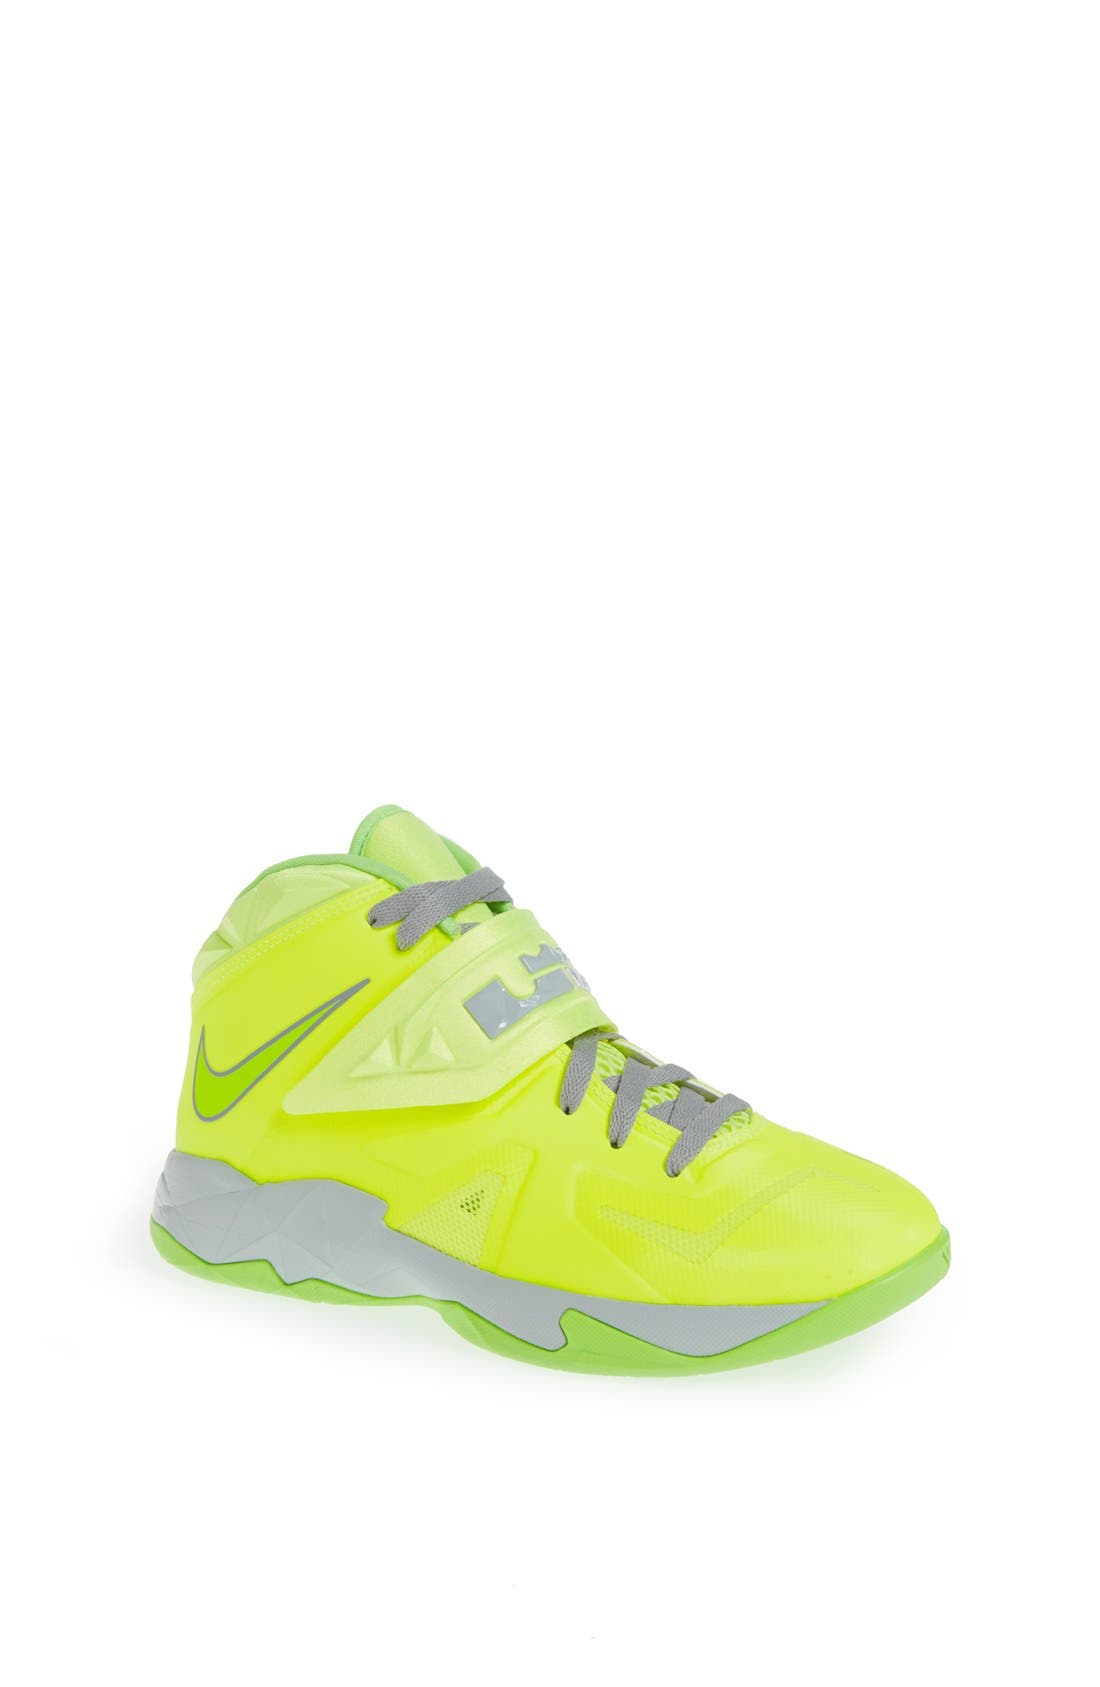 Main Image - Nike 'LeBron Zoom Soldier VII' Basketball Shoe (Big Kid)